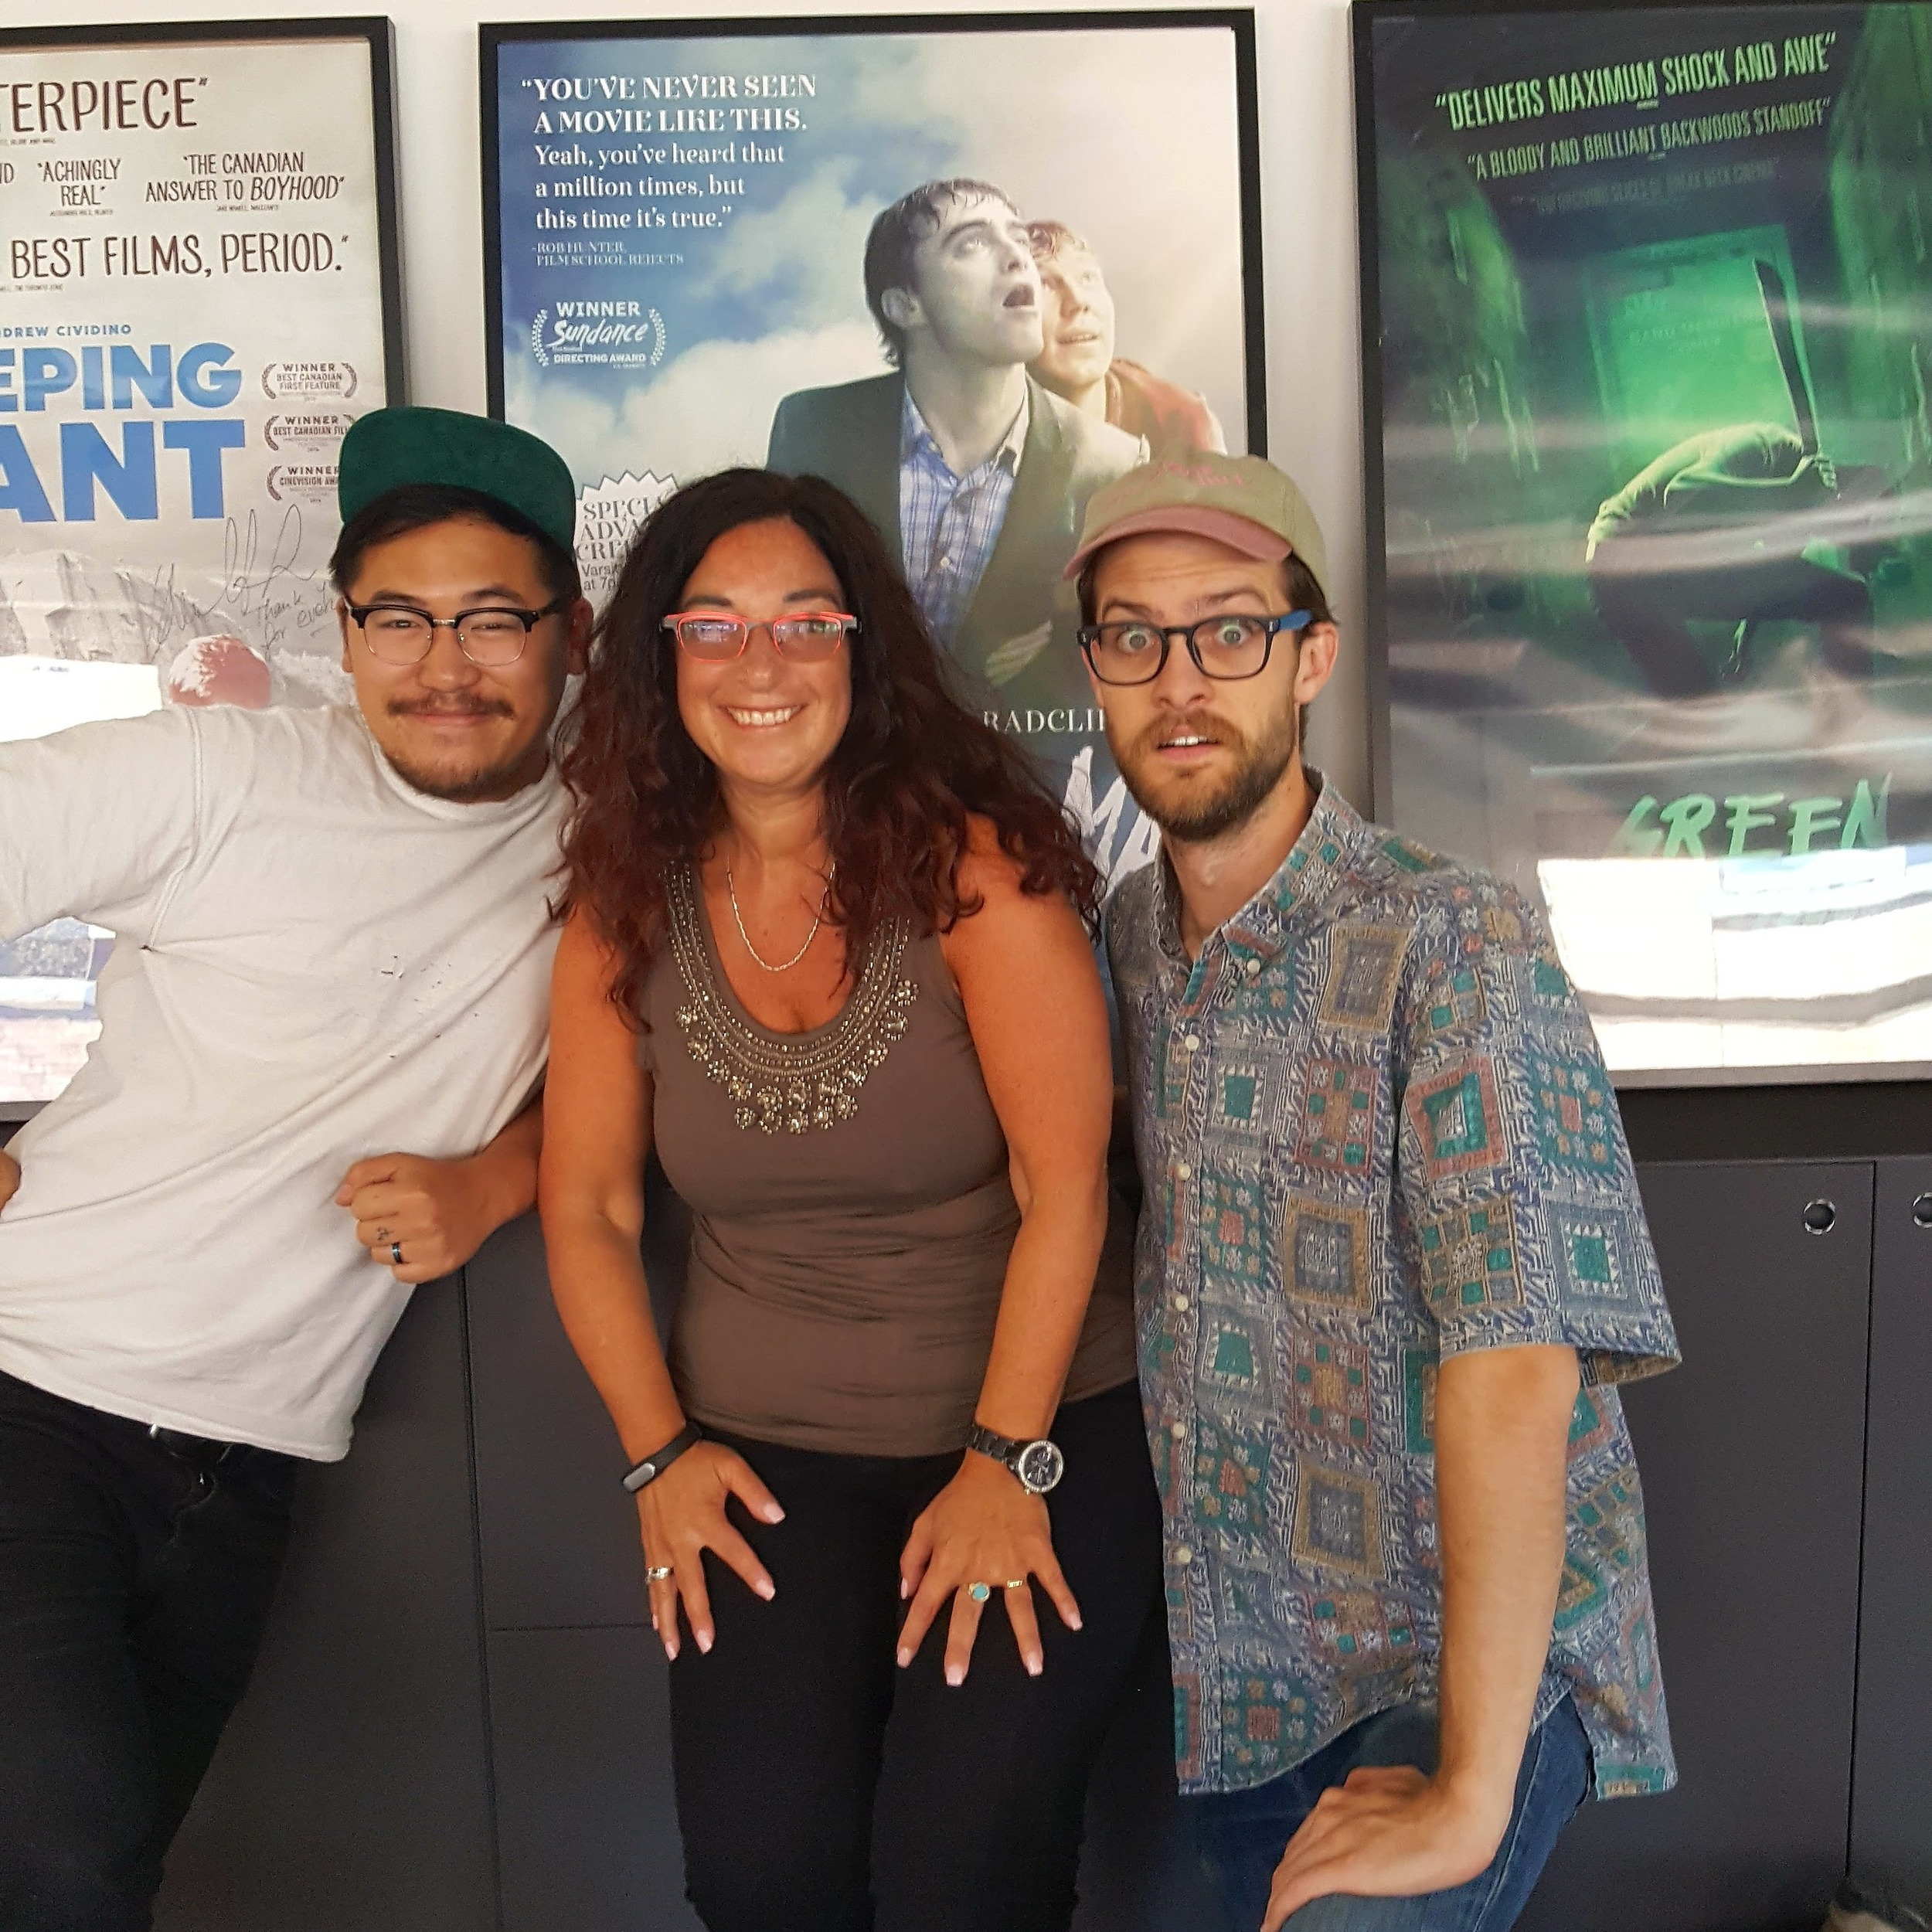 Me with Dan Kwan and Daniel Scheinert